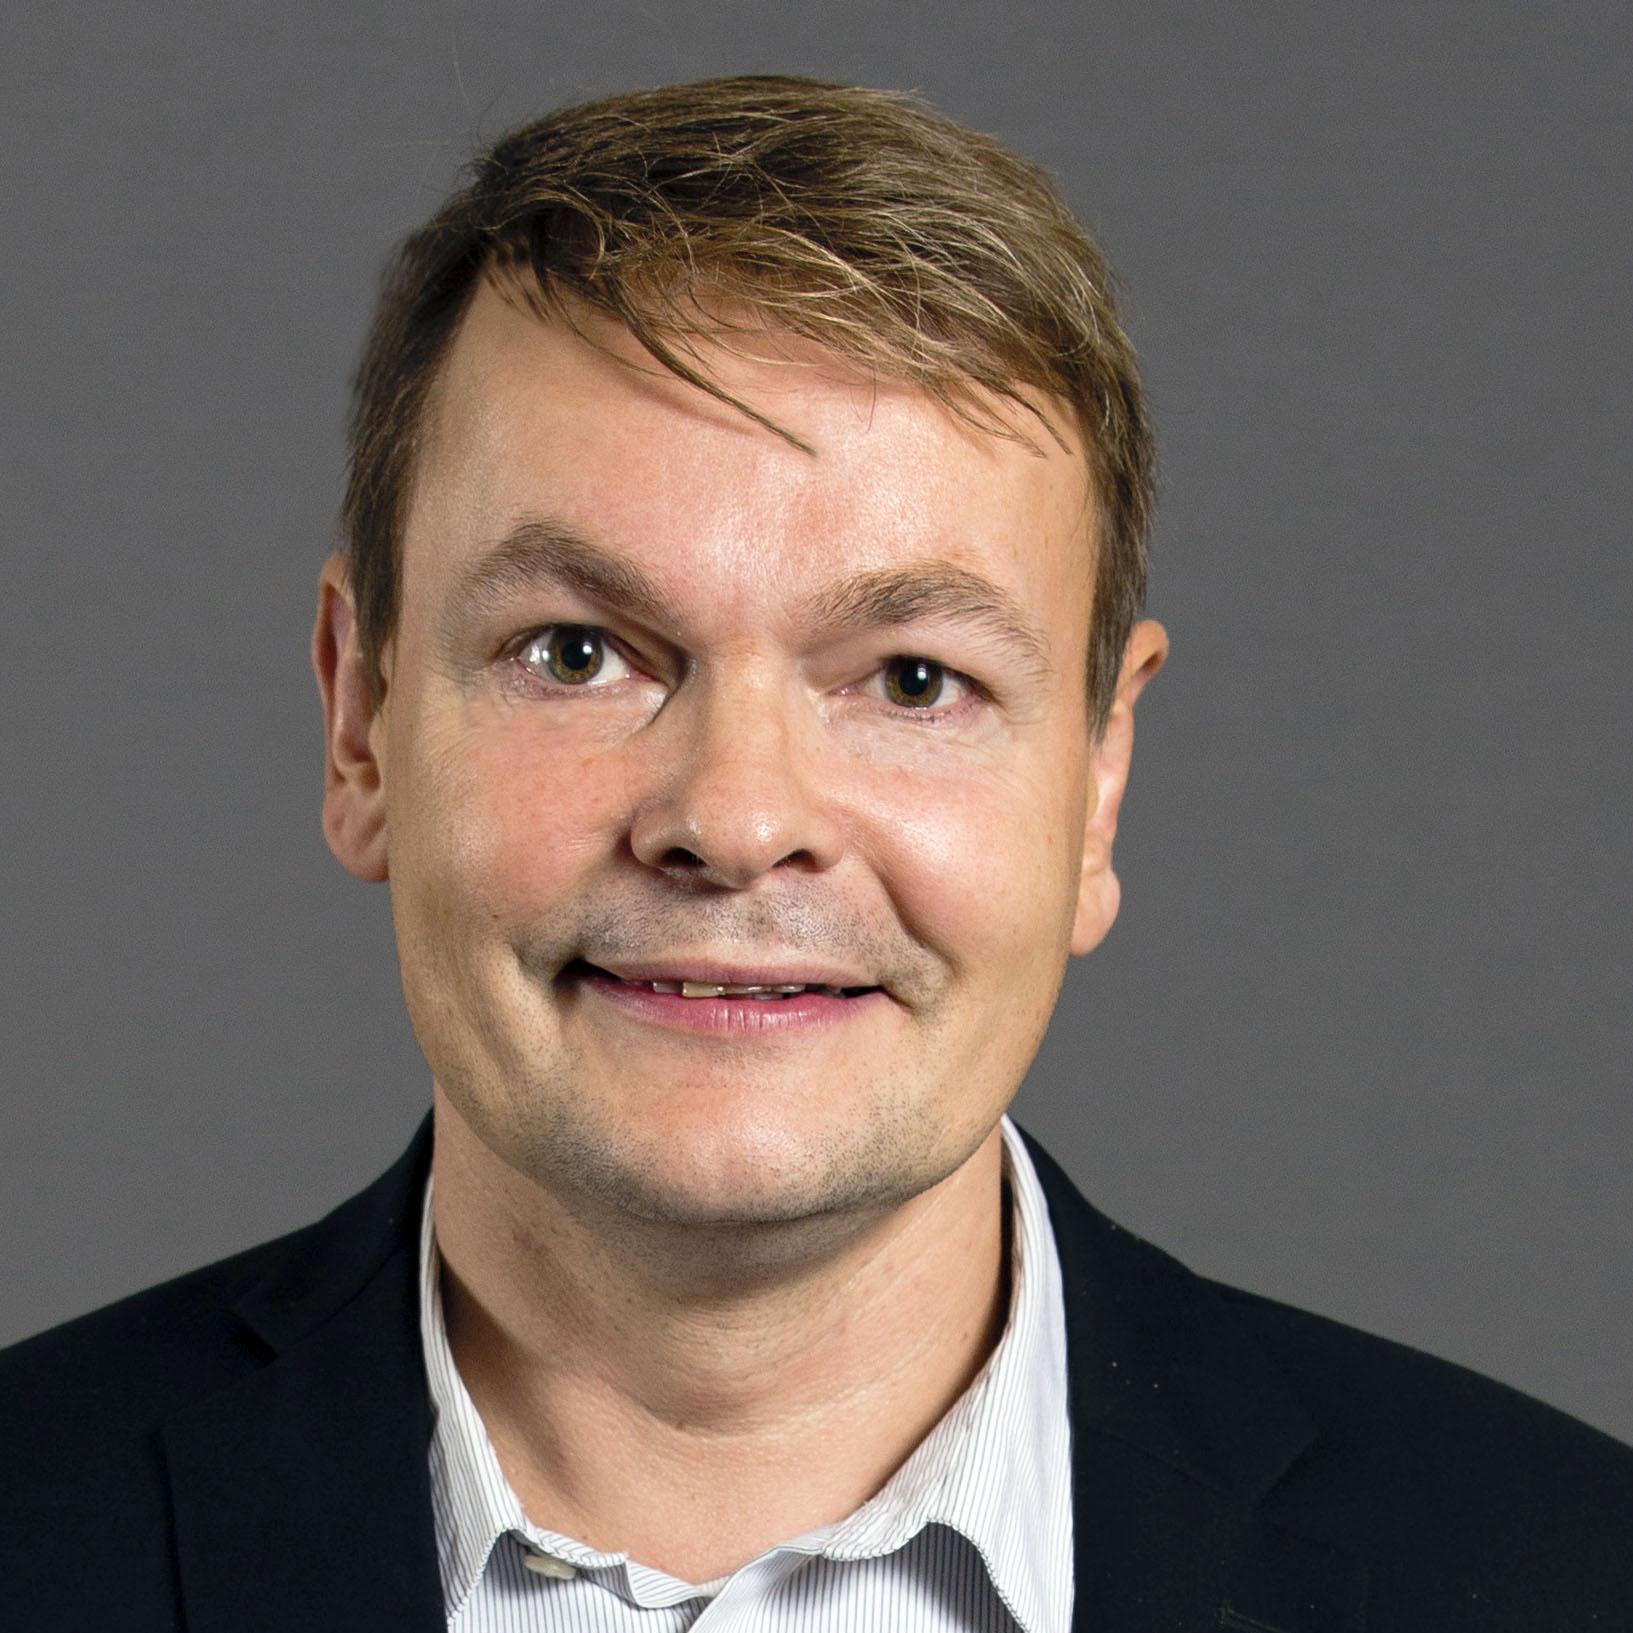 Johan Backman